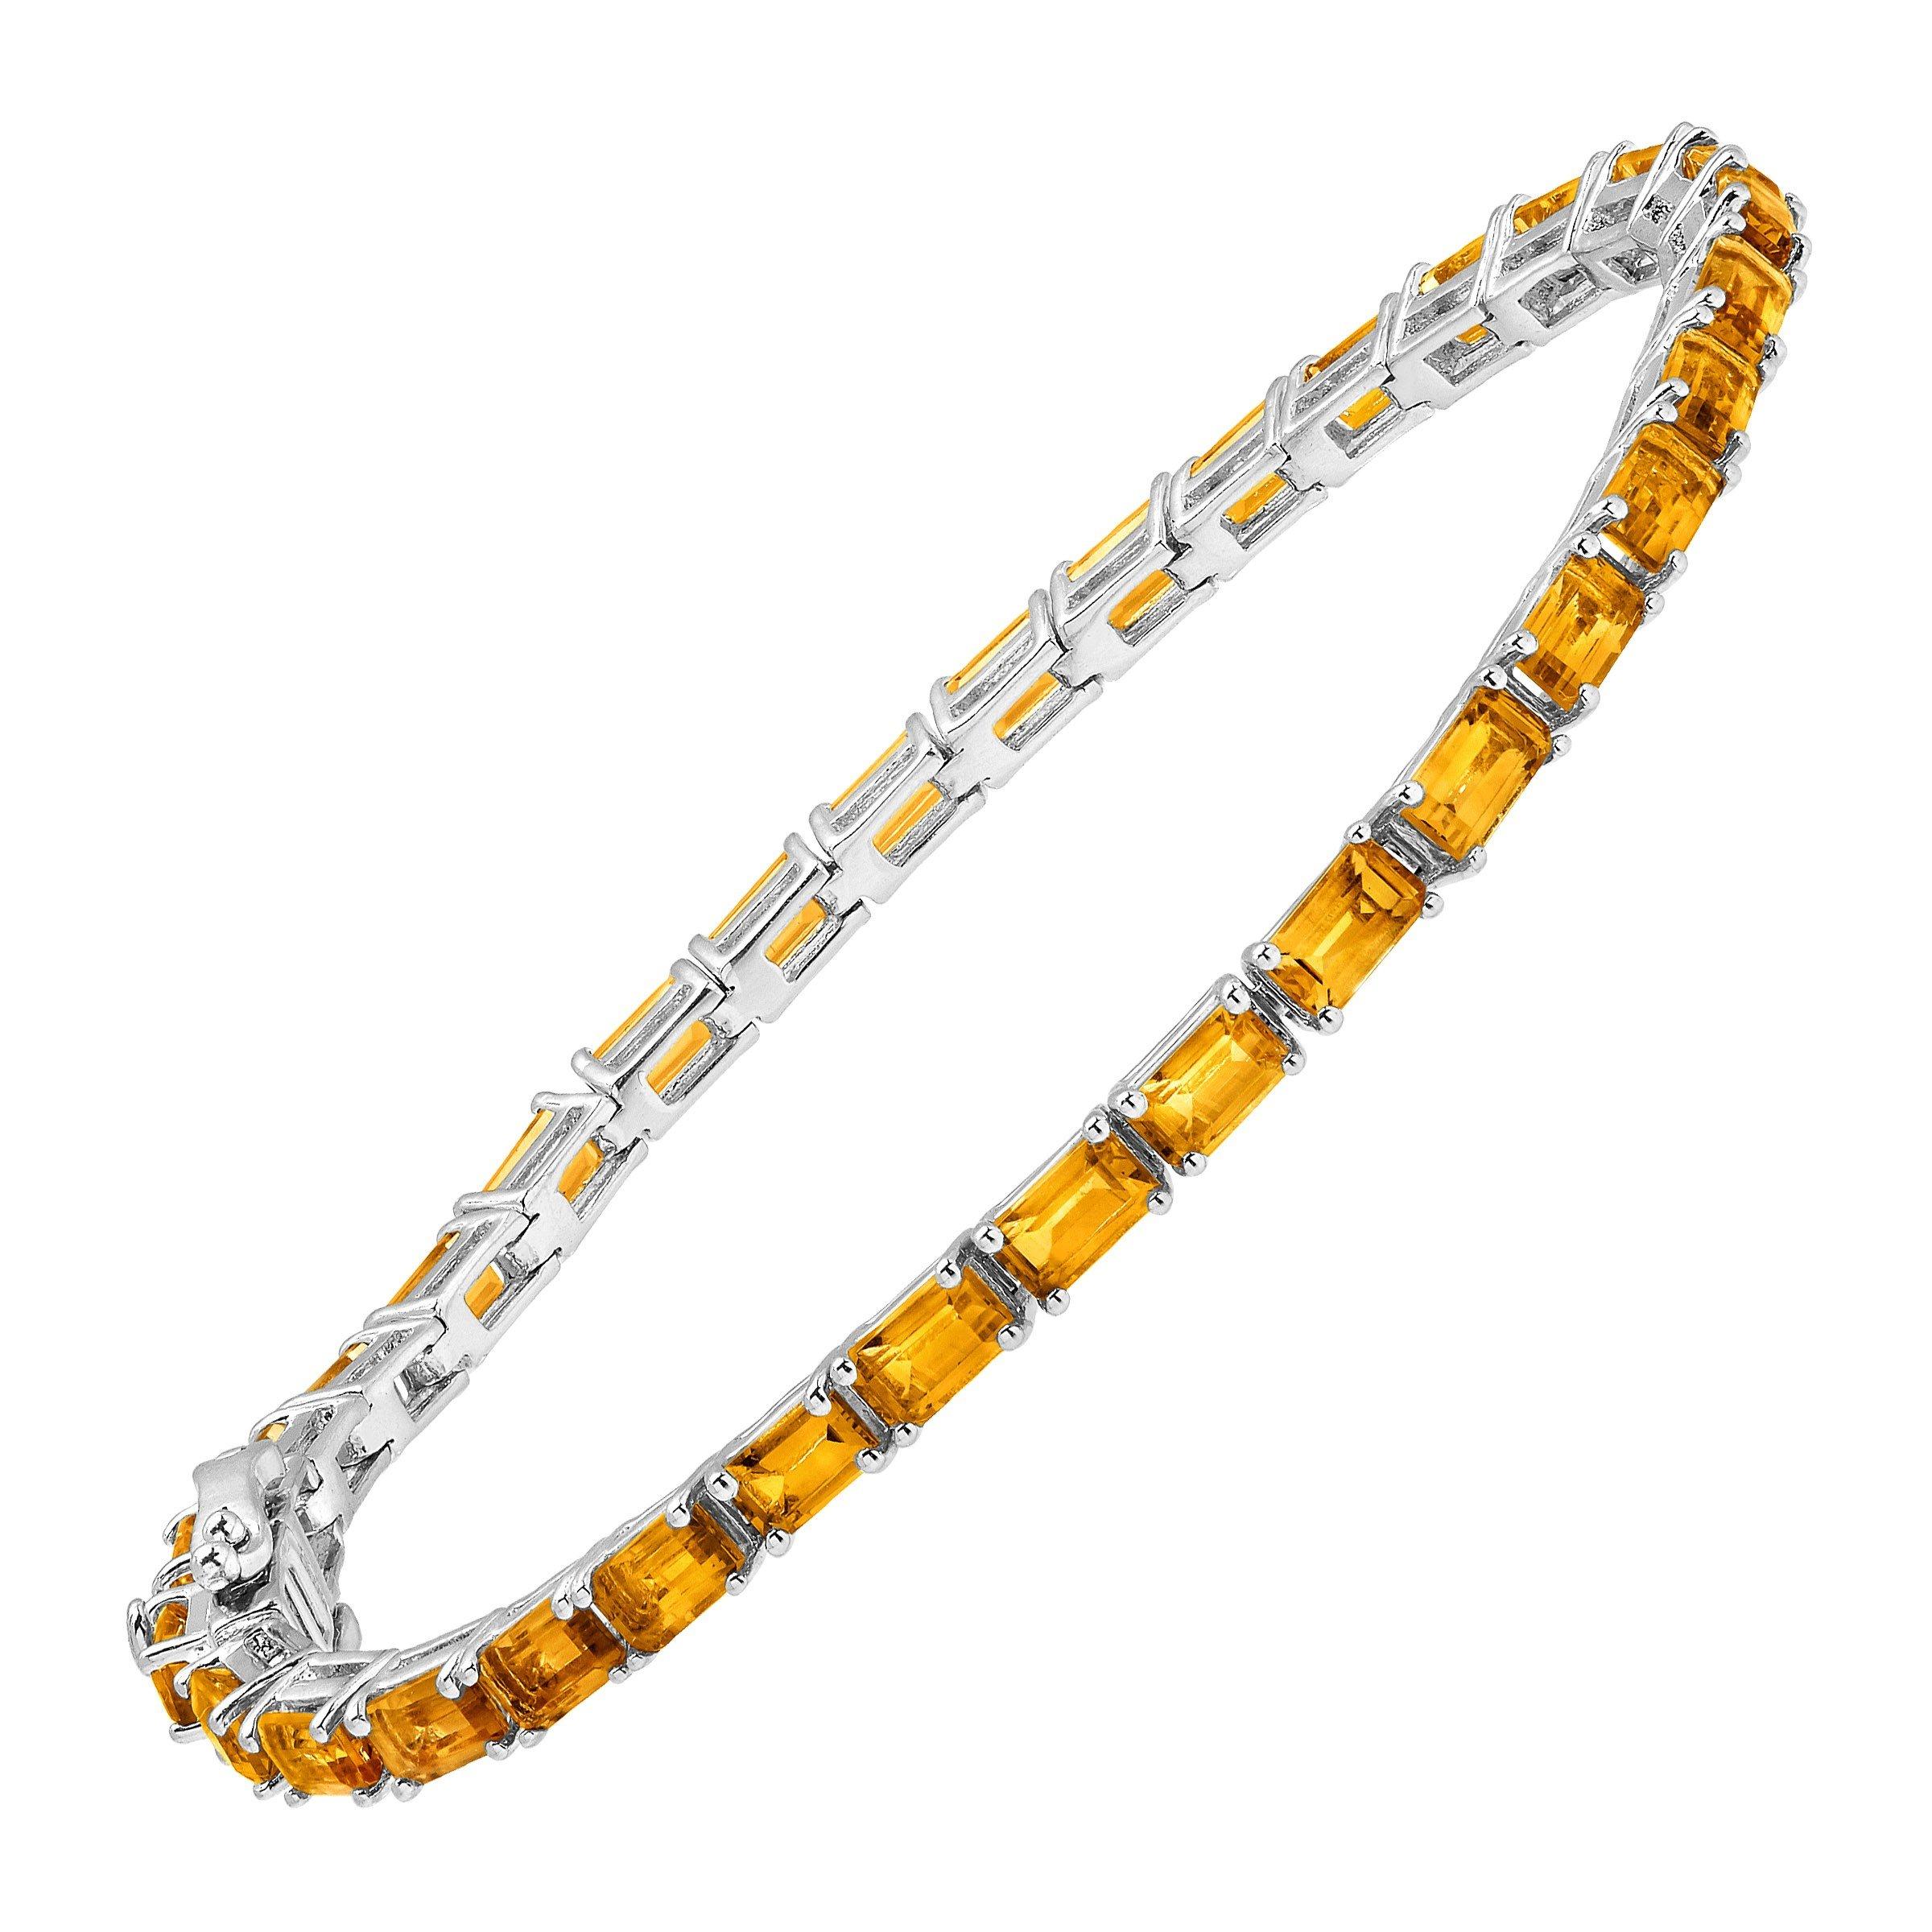 6 1/4 ct Natural Citrine Emerald-Cut Tennis Bracelet in Sterling Silver, 7''